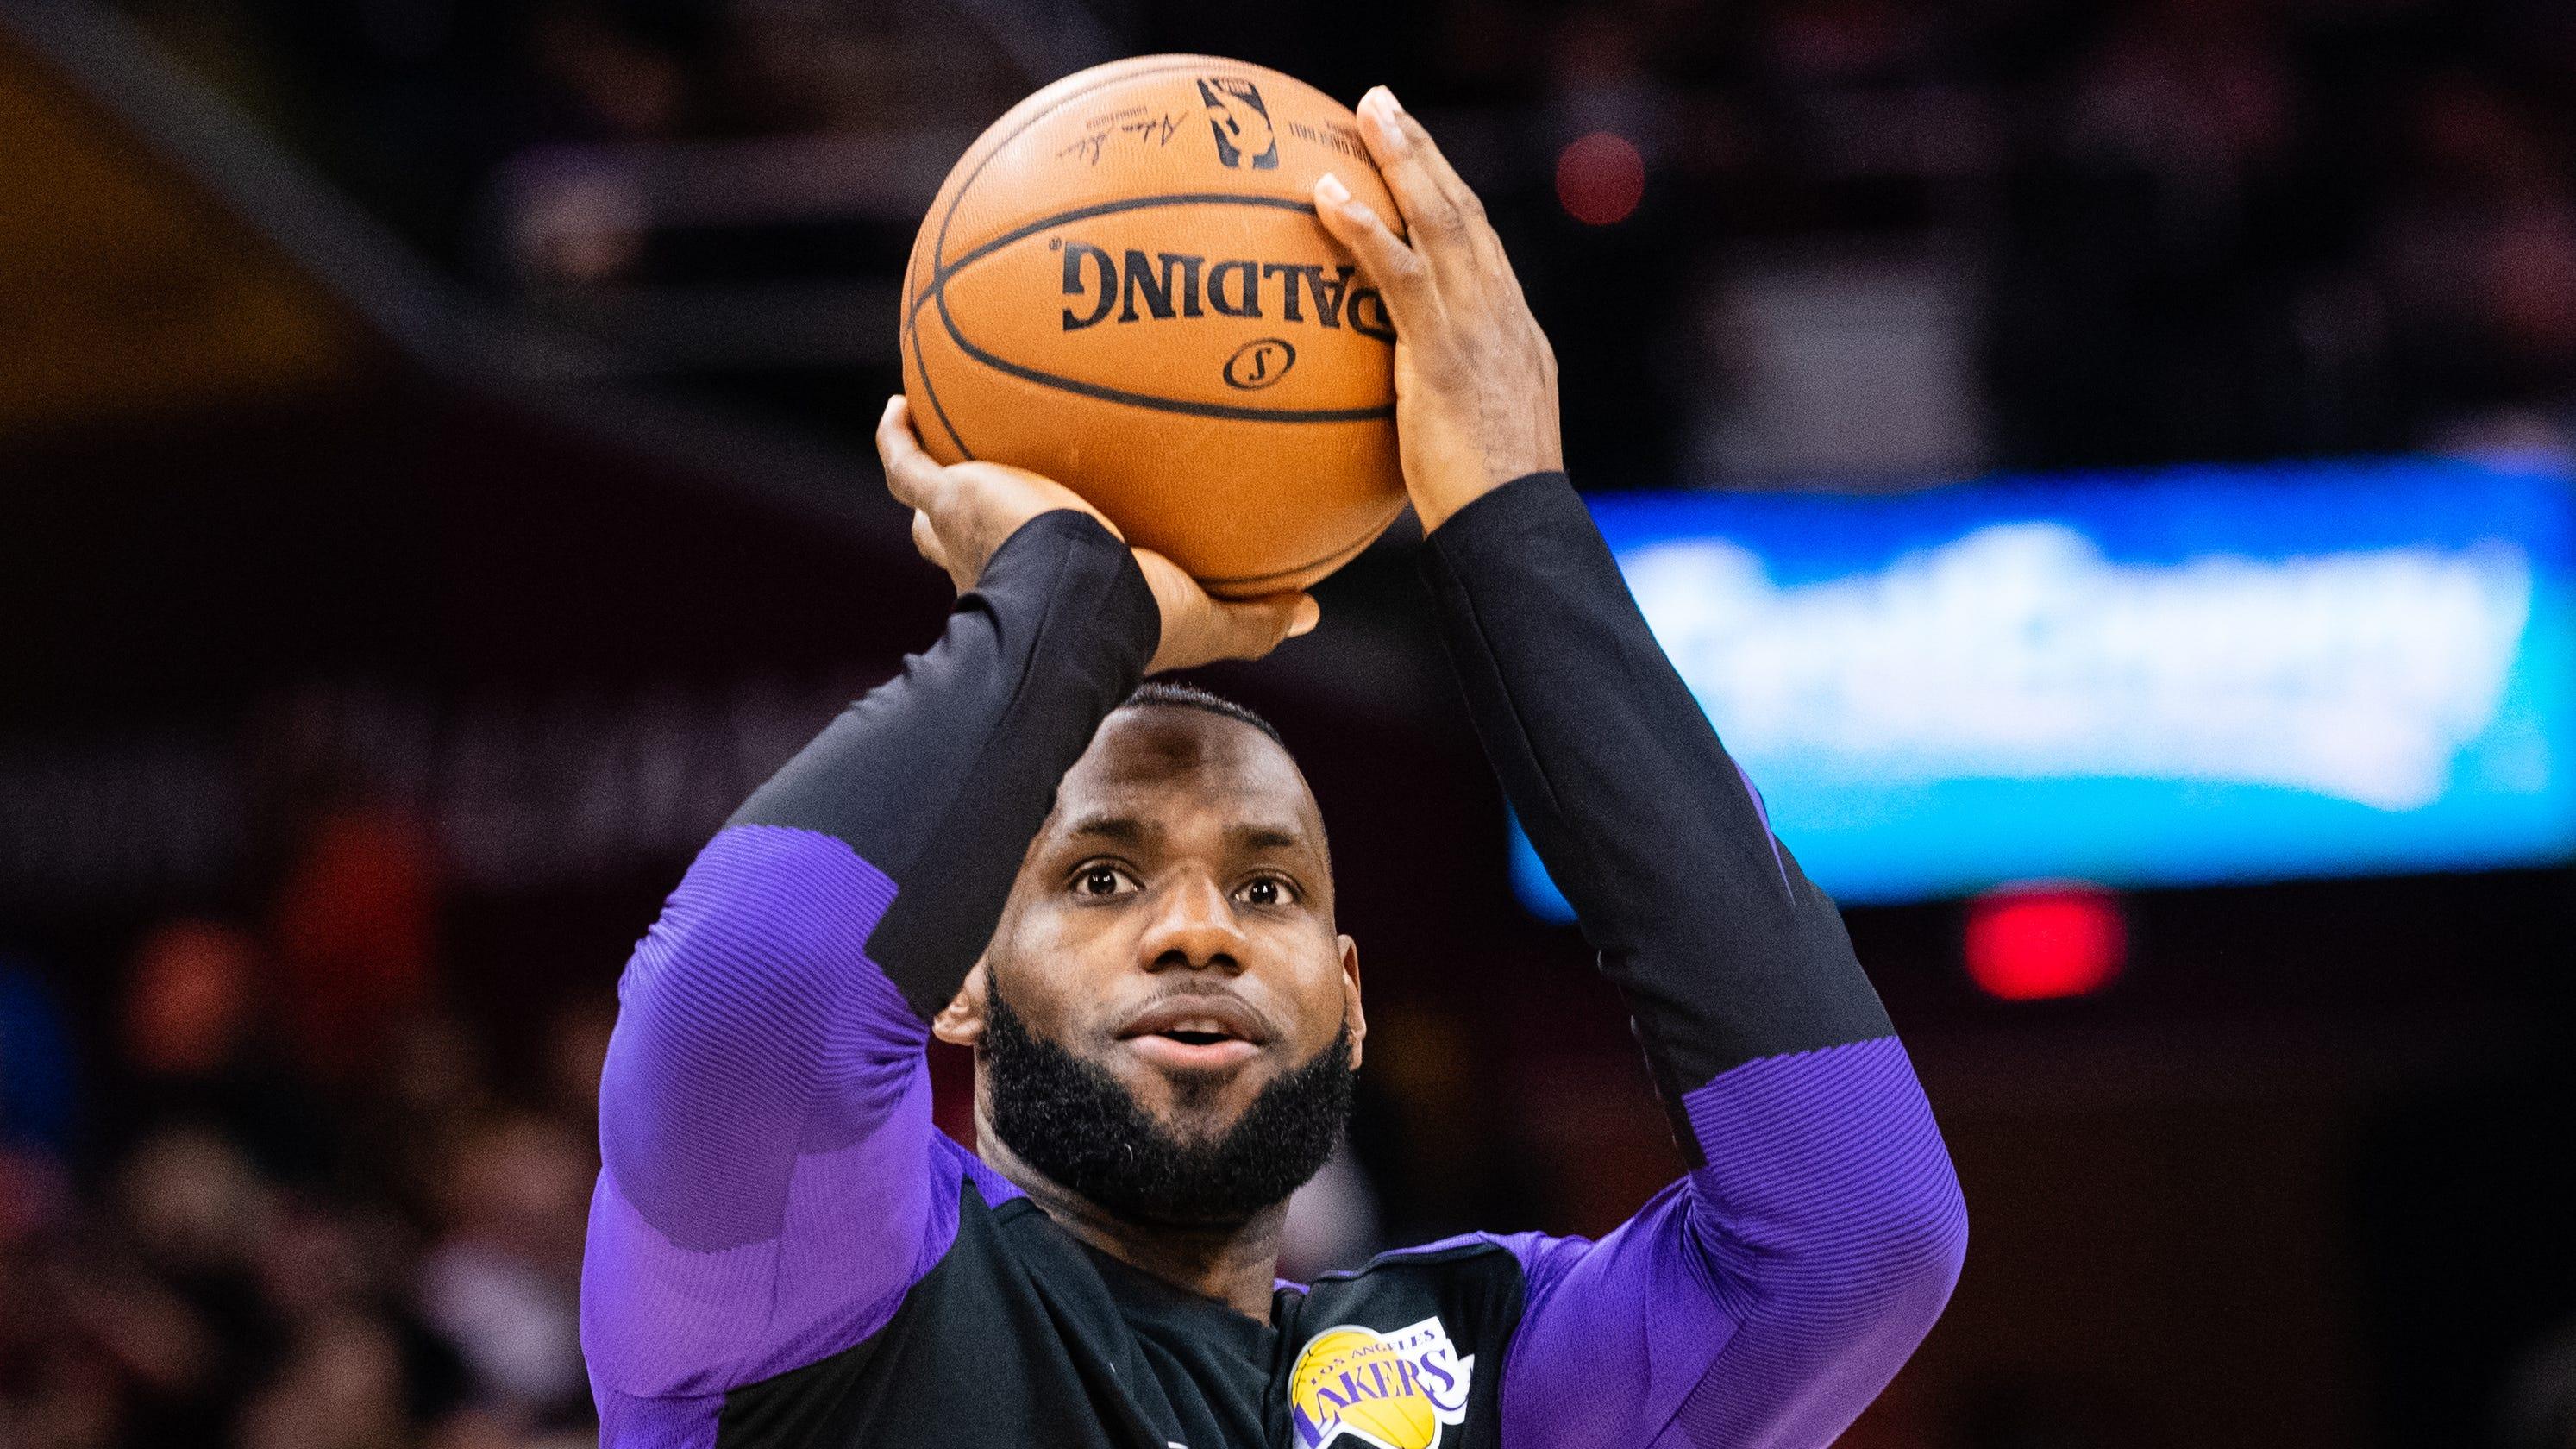 280a25864 LeBron James  return  Cavaliers fans give star ovation